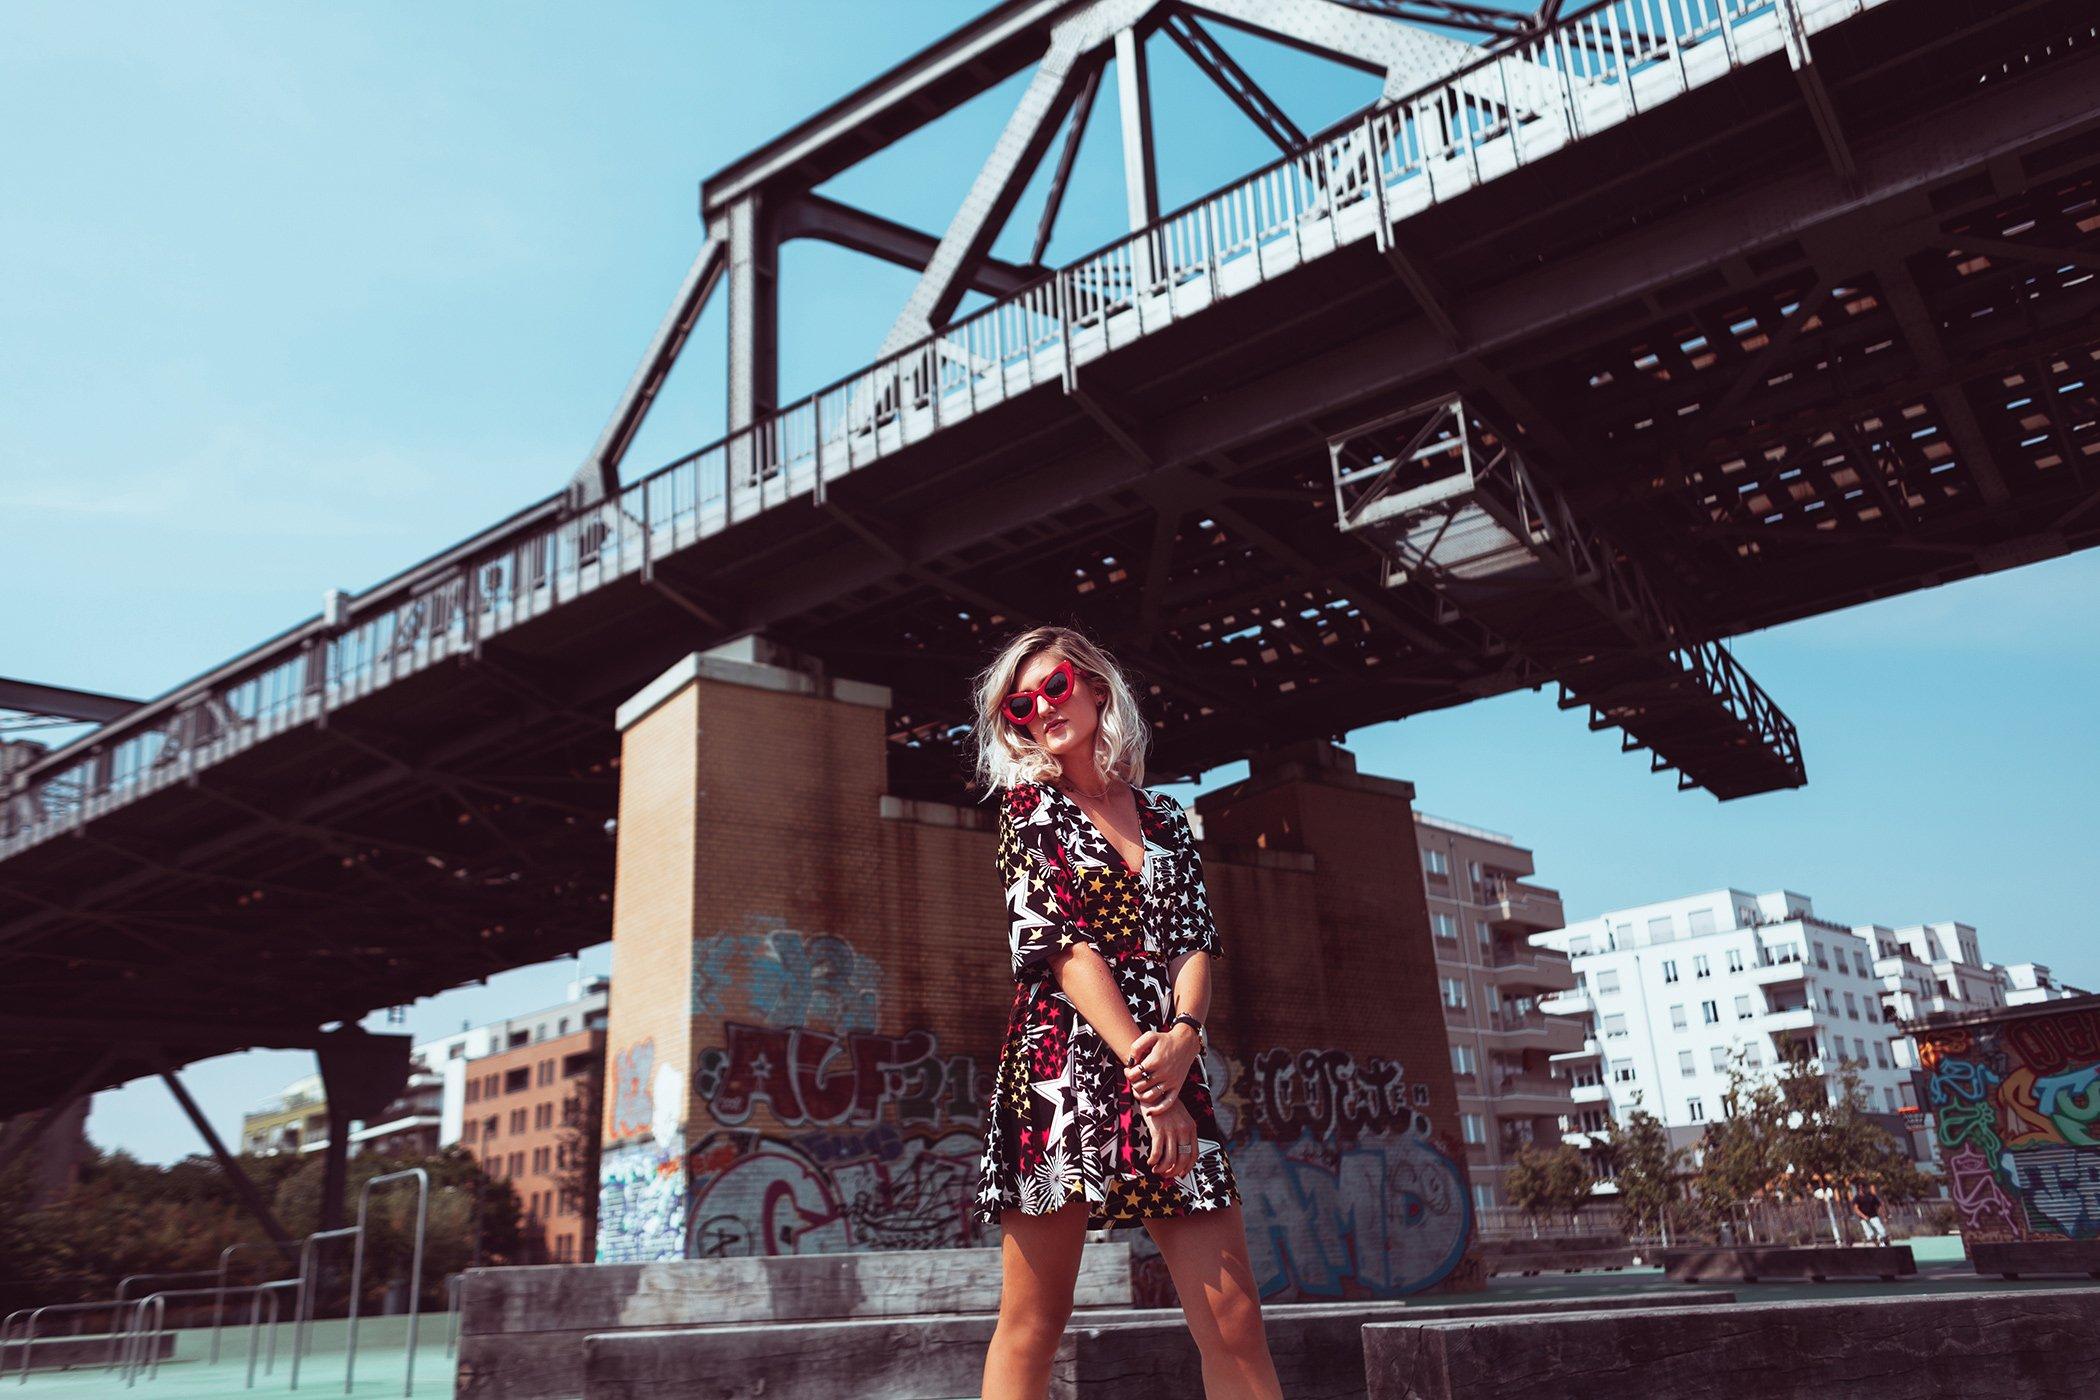 mikuta-star-dress-and-red-cat-eye-sunglasses-3